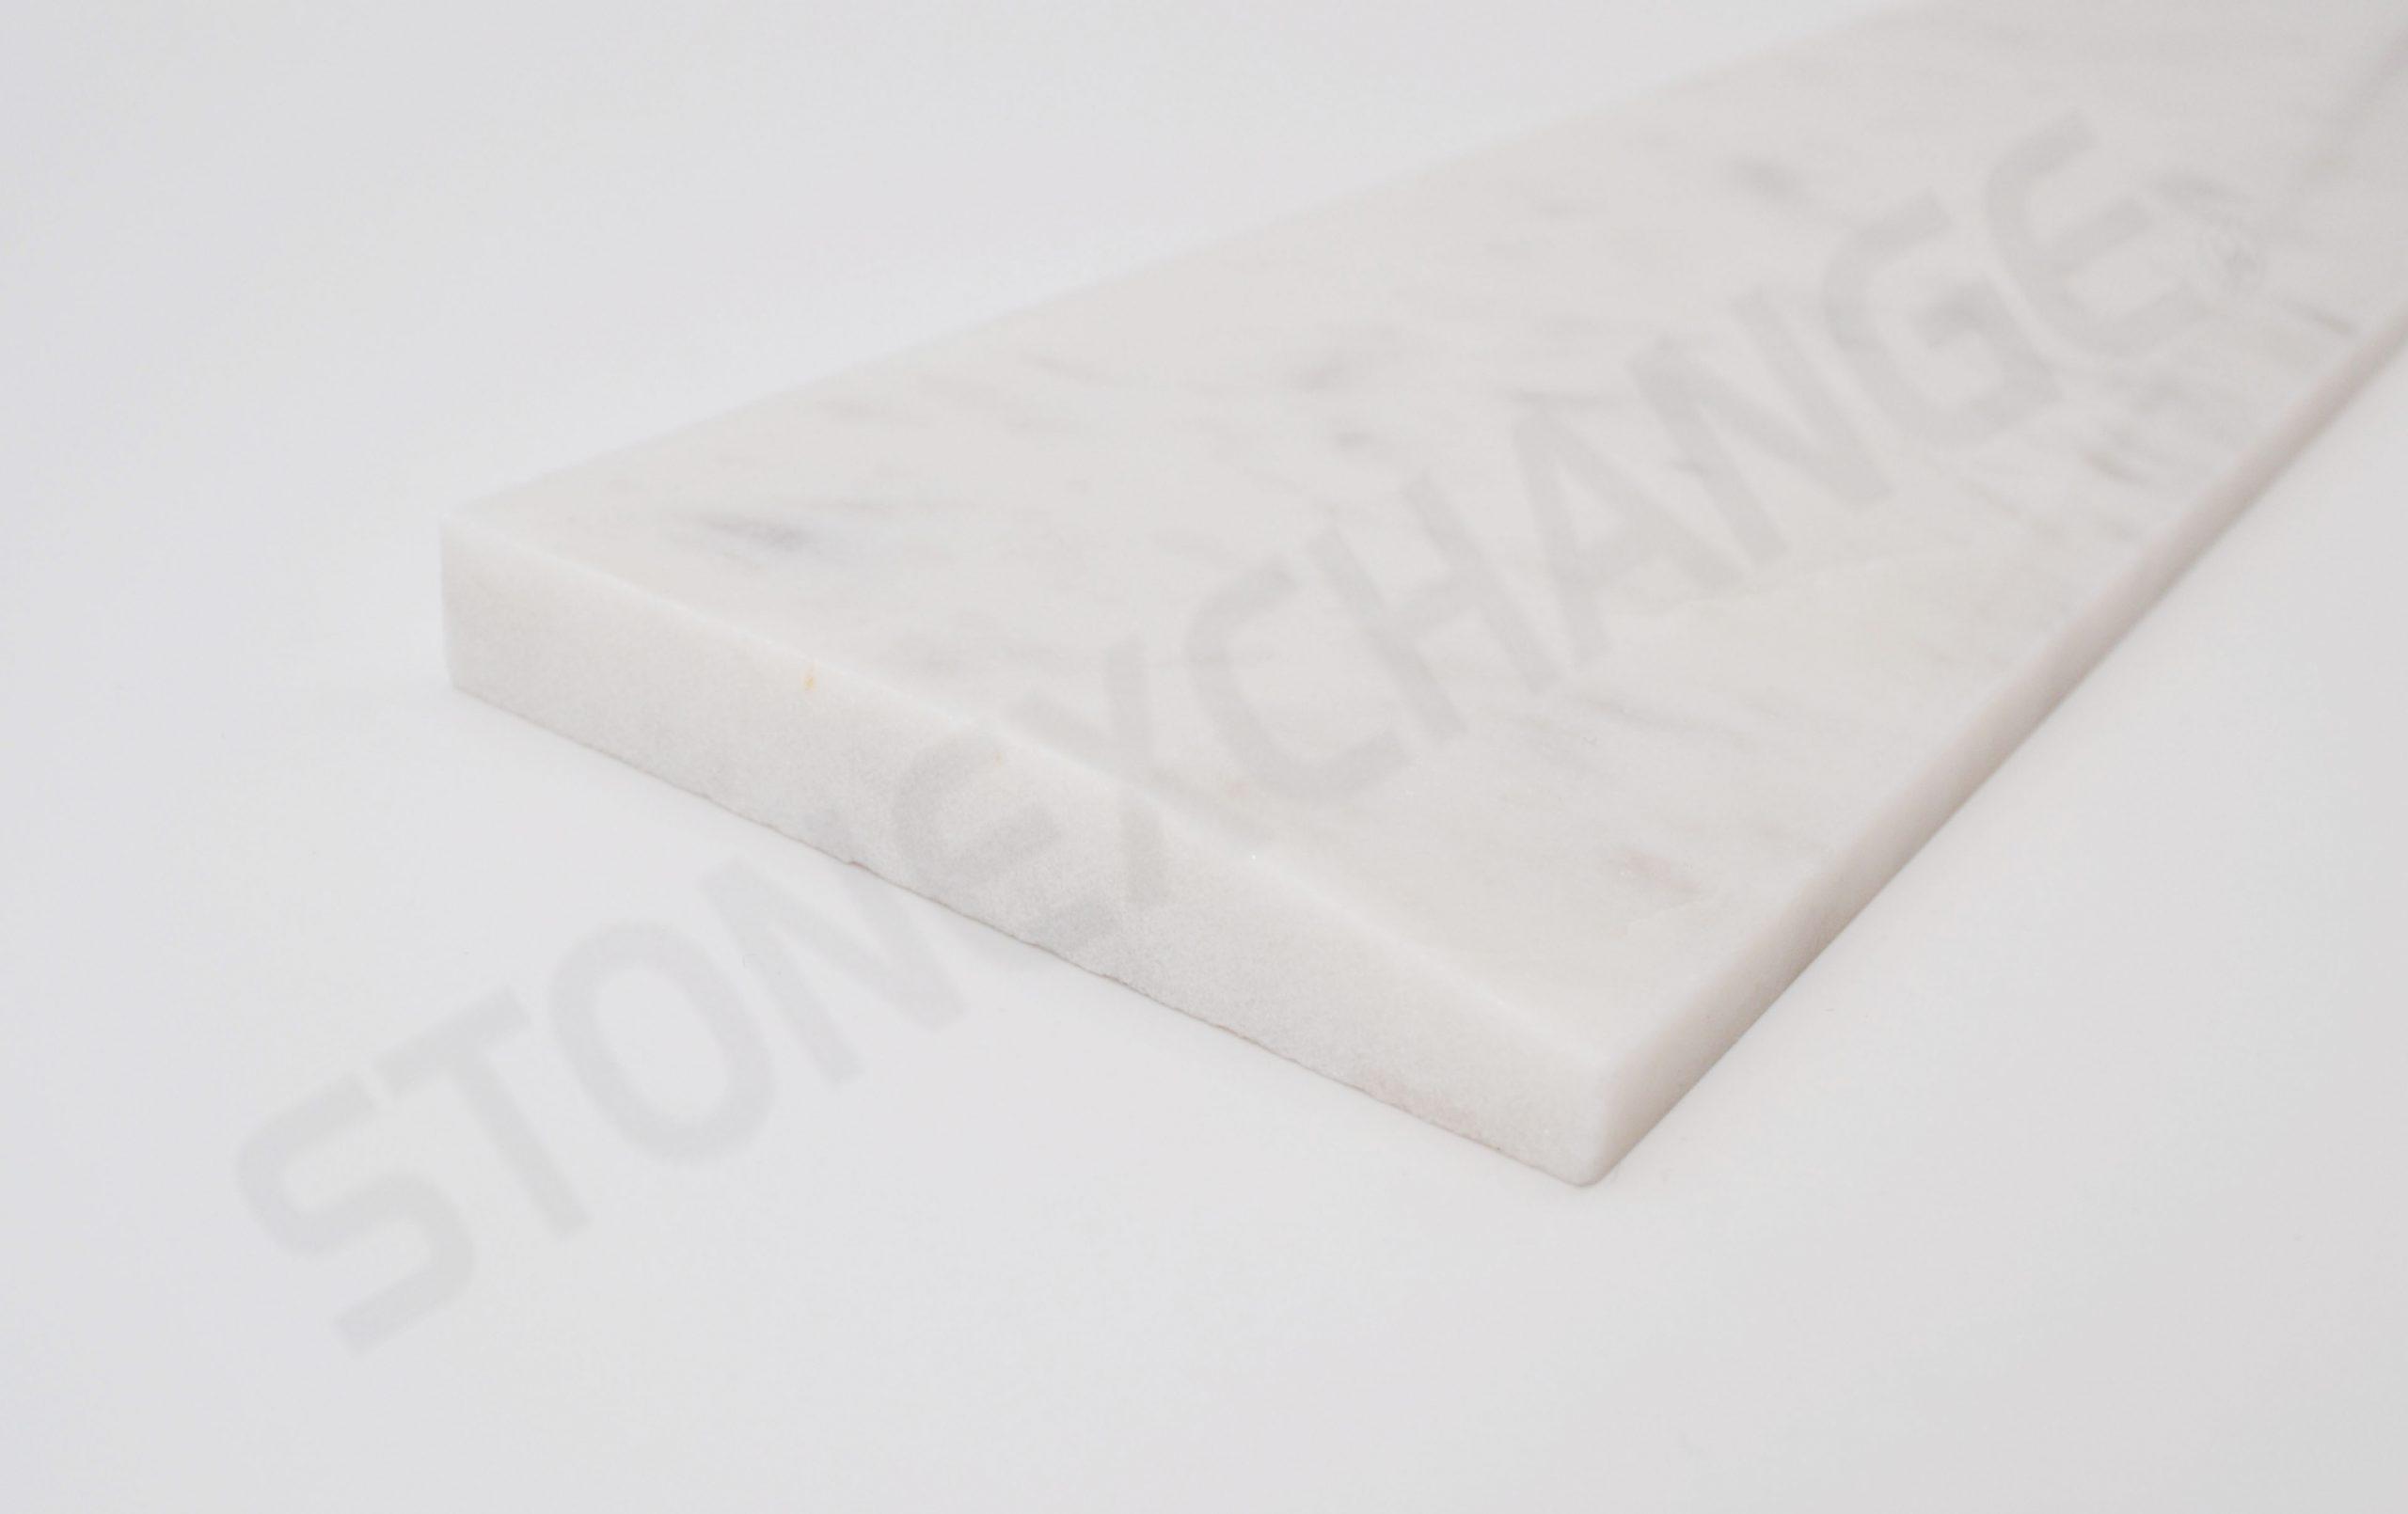 White Carrara Single Hollywood Bevel Threshold 4x36